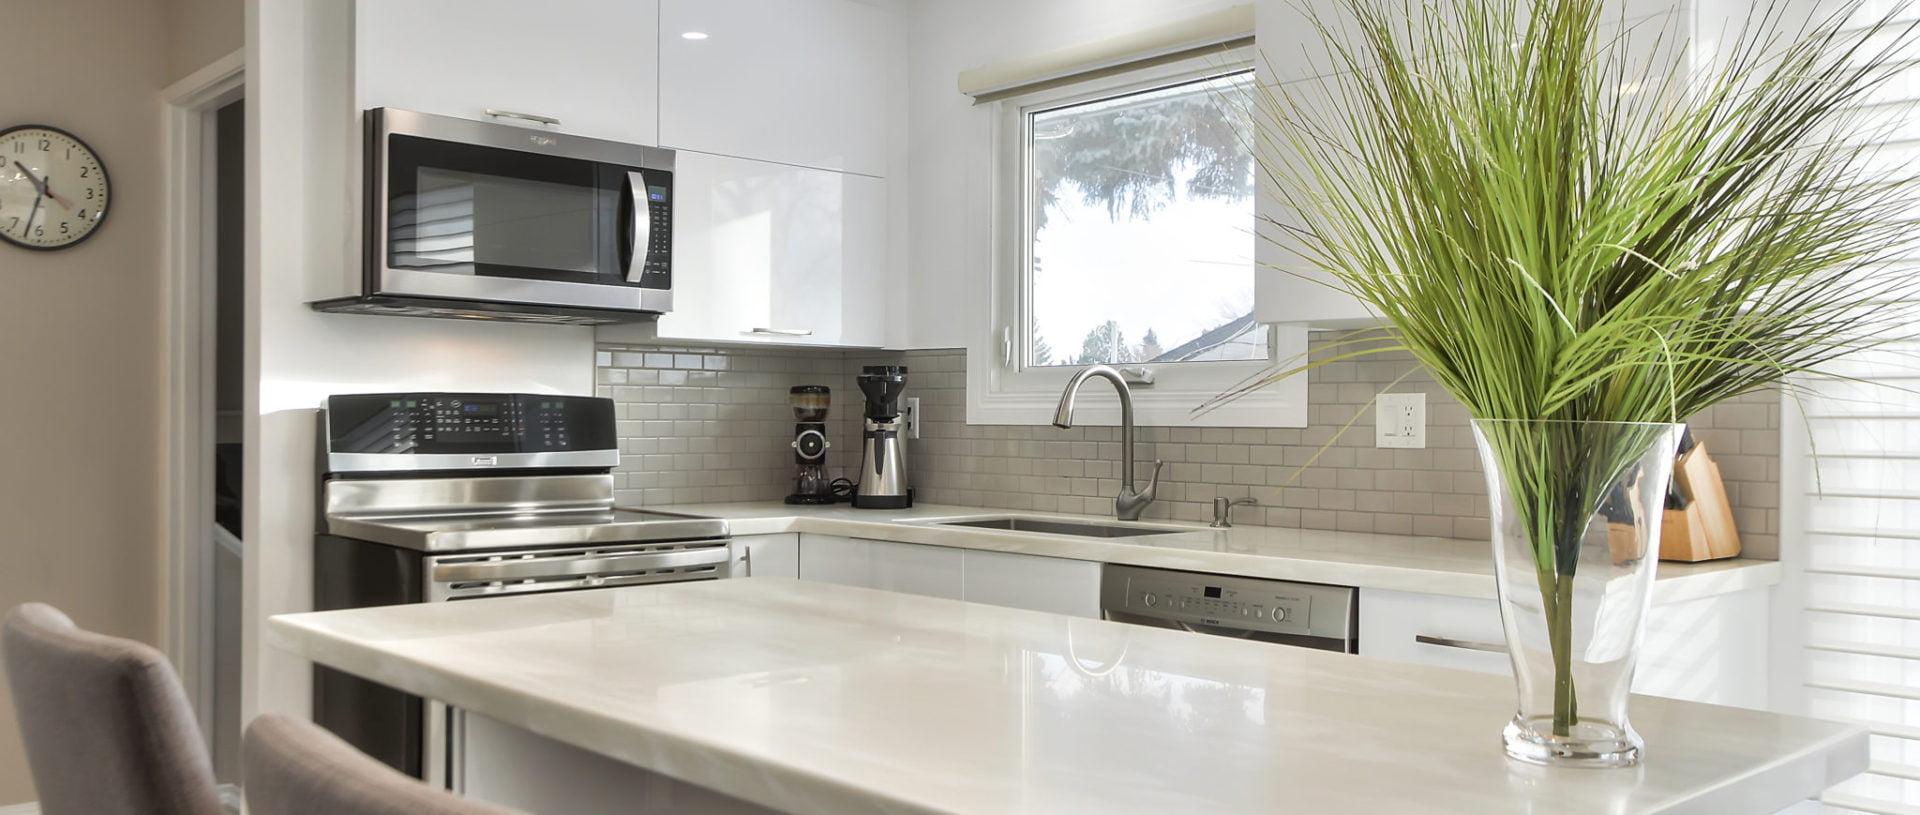 Custom kitchen renovation in Edmonton in Modern style